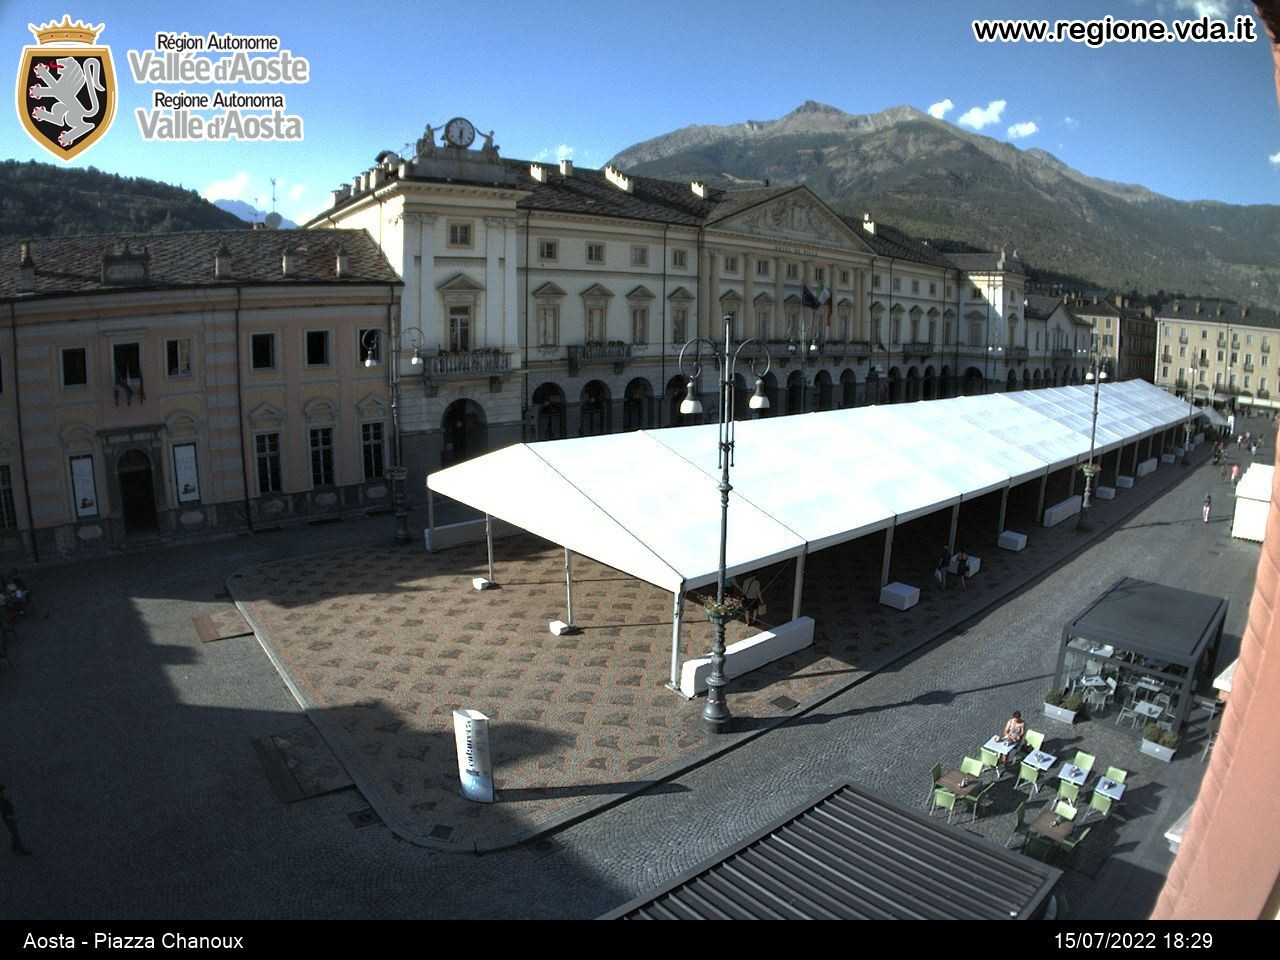 Webcam Aosta Piazza Chanoux 588 M Aosta And